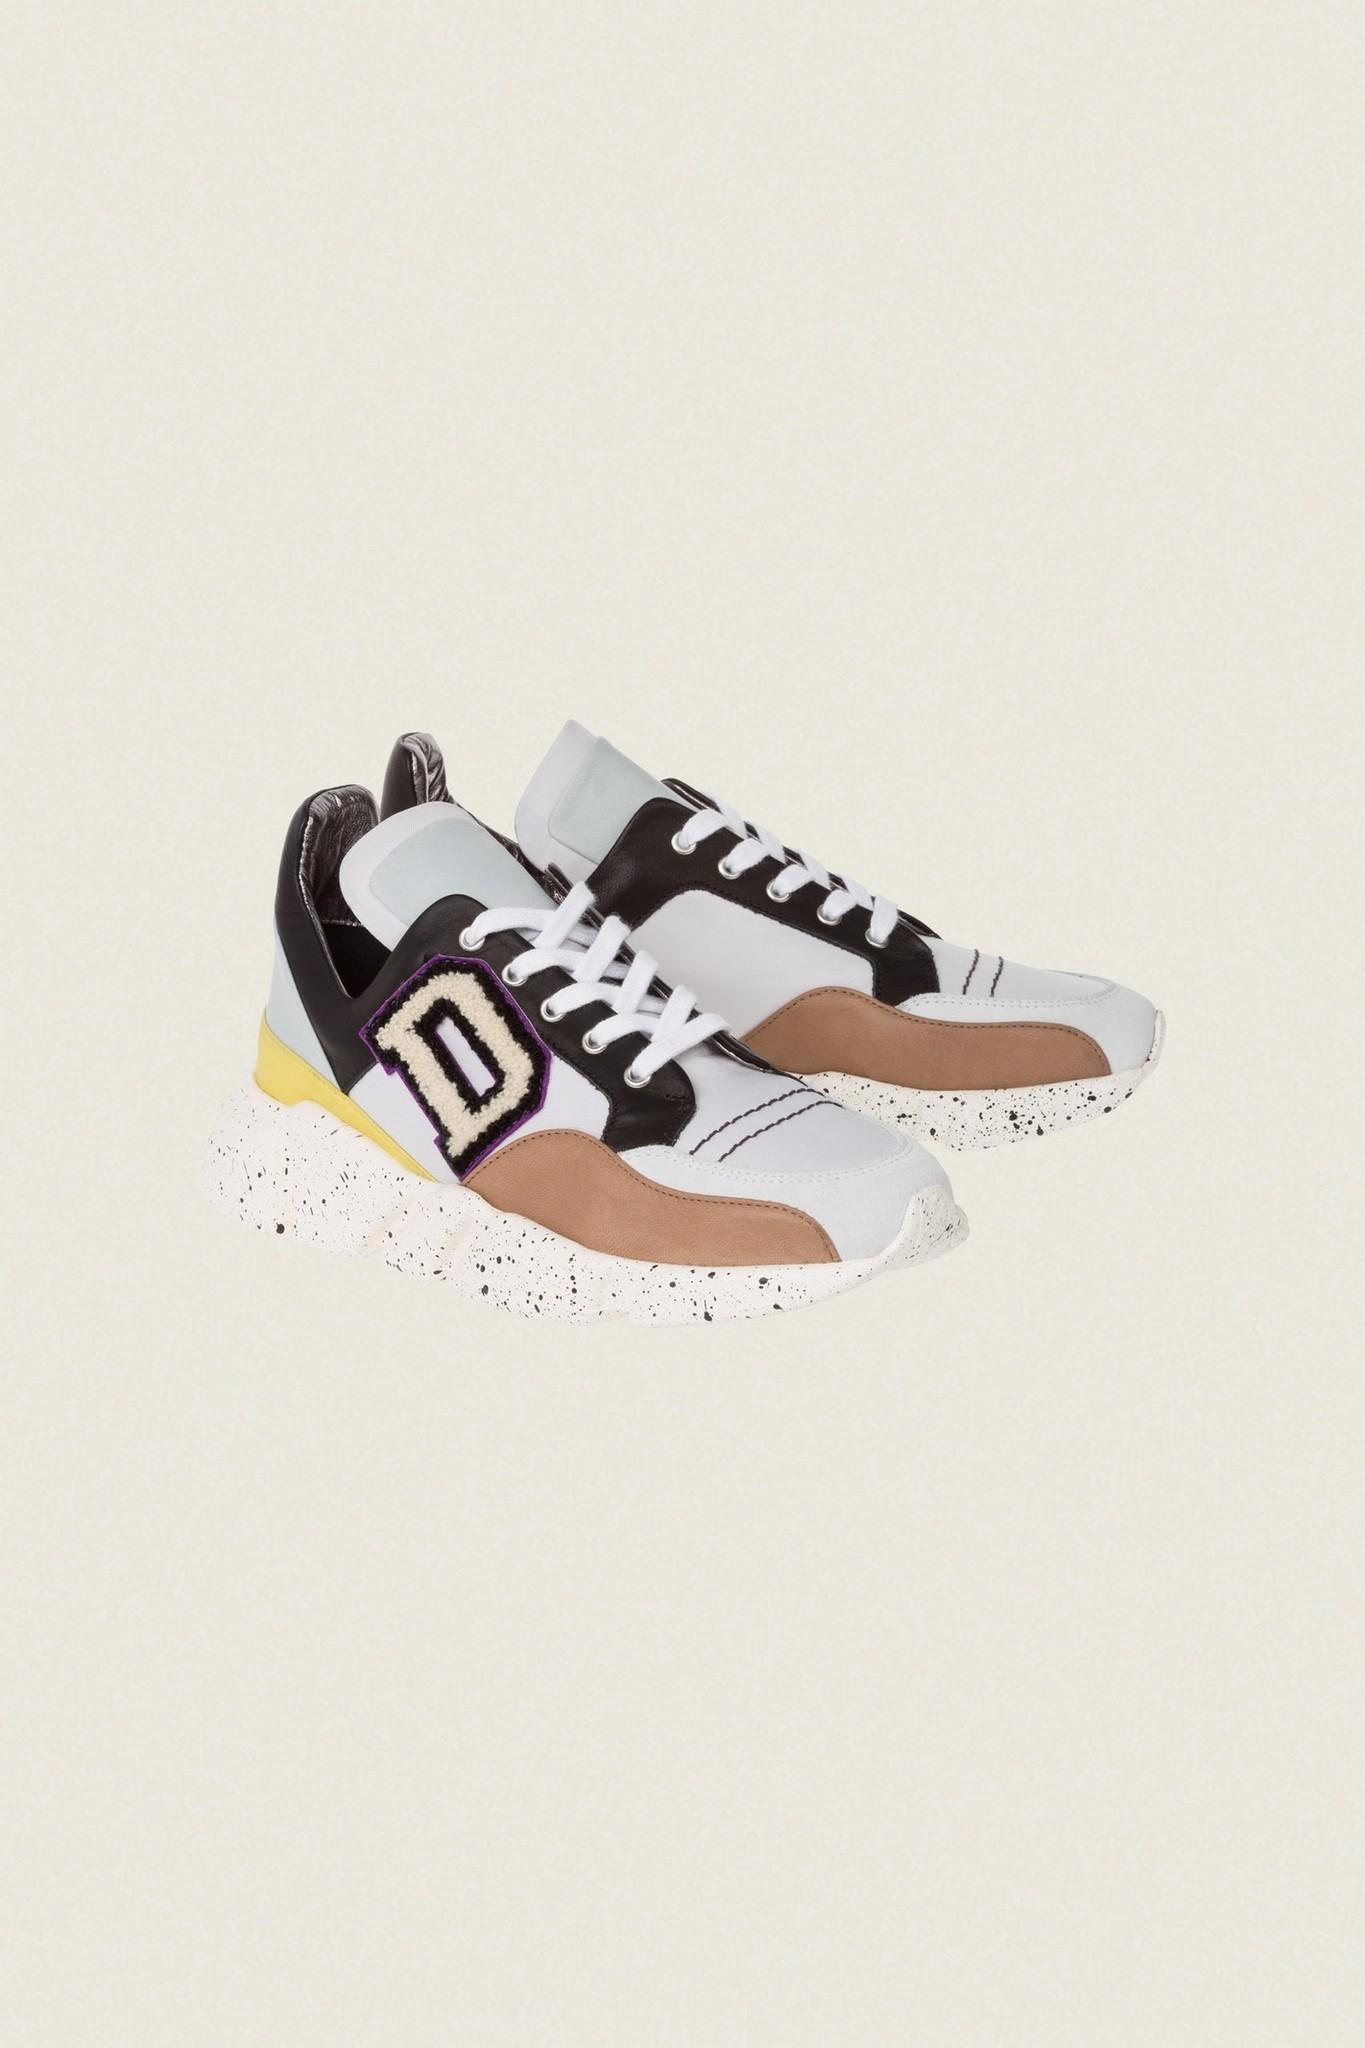 Patch Ambition D sneaker dorothee schumacher-6